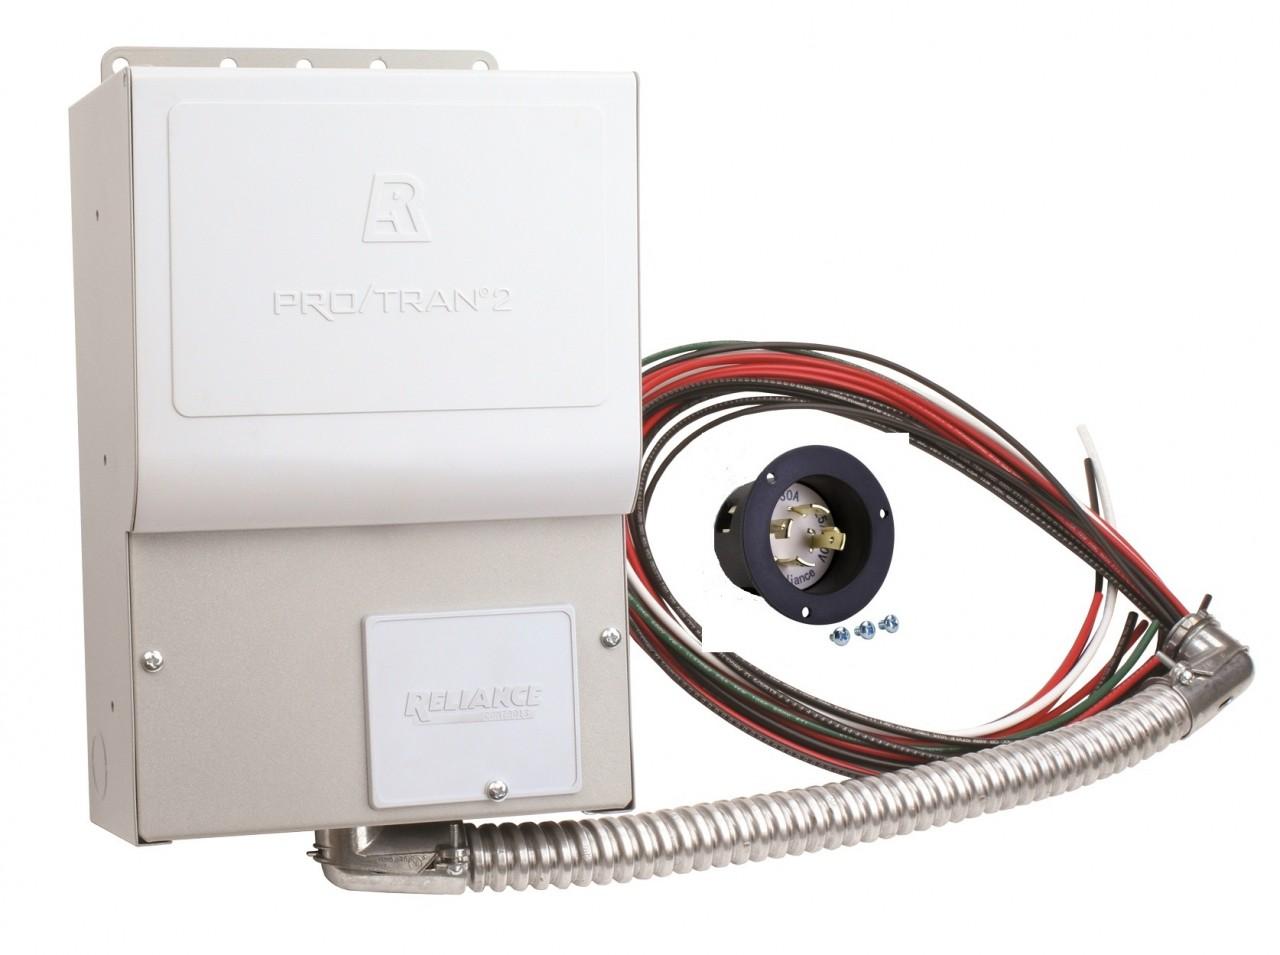 Astonishing Reliance Controls Protran 304B Indoor Manual Transfer Switch 30A Wiring Cloud Apomsimijknierdonabenoleattemohammedshrineorg